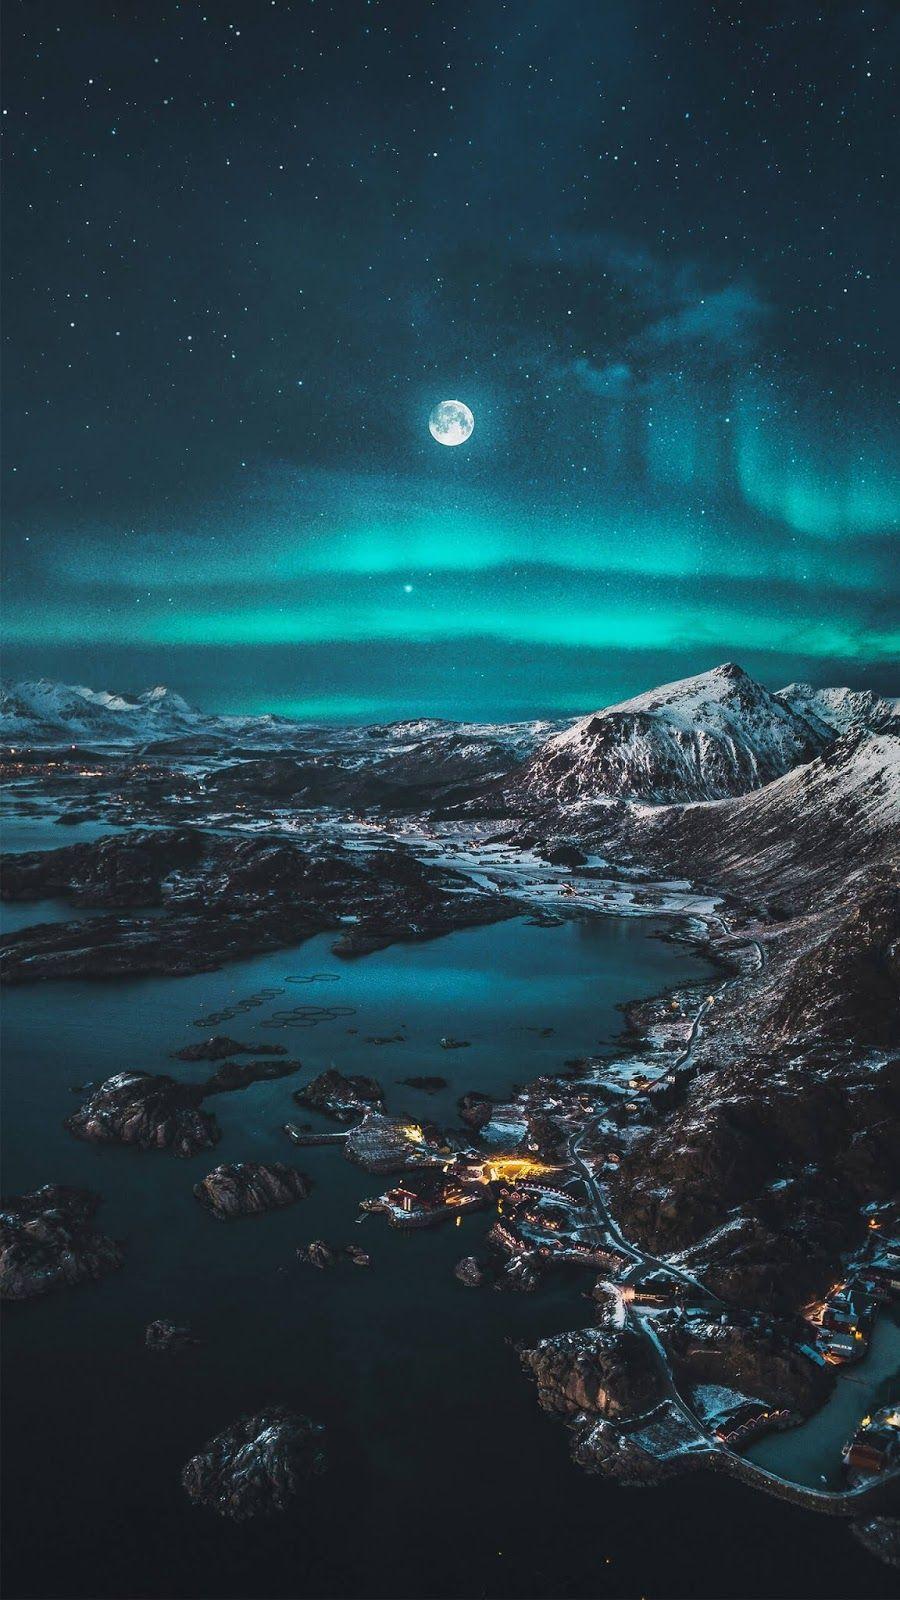 Calm Night Wallpaper Iphone Android Background Followme Northern Lights Wallpaper Nature Wallpaper Landscape Wallpaper